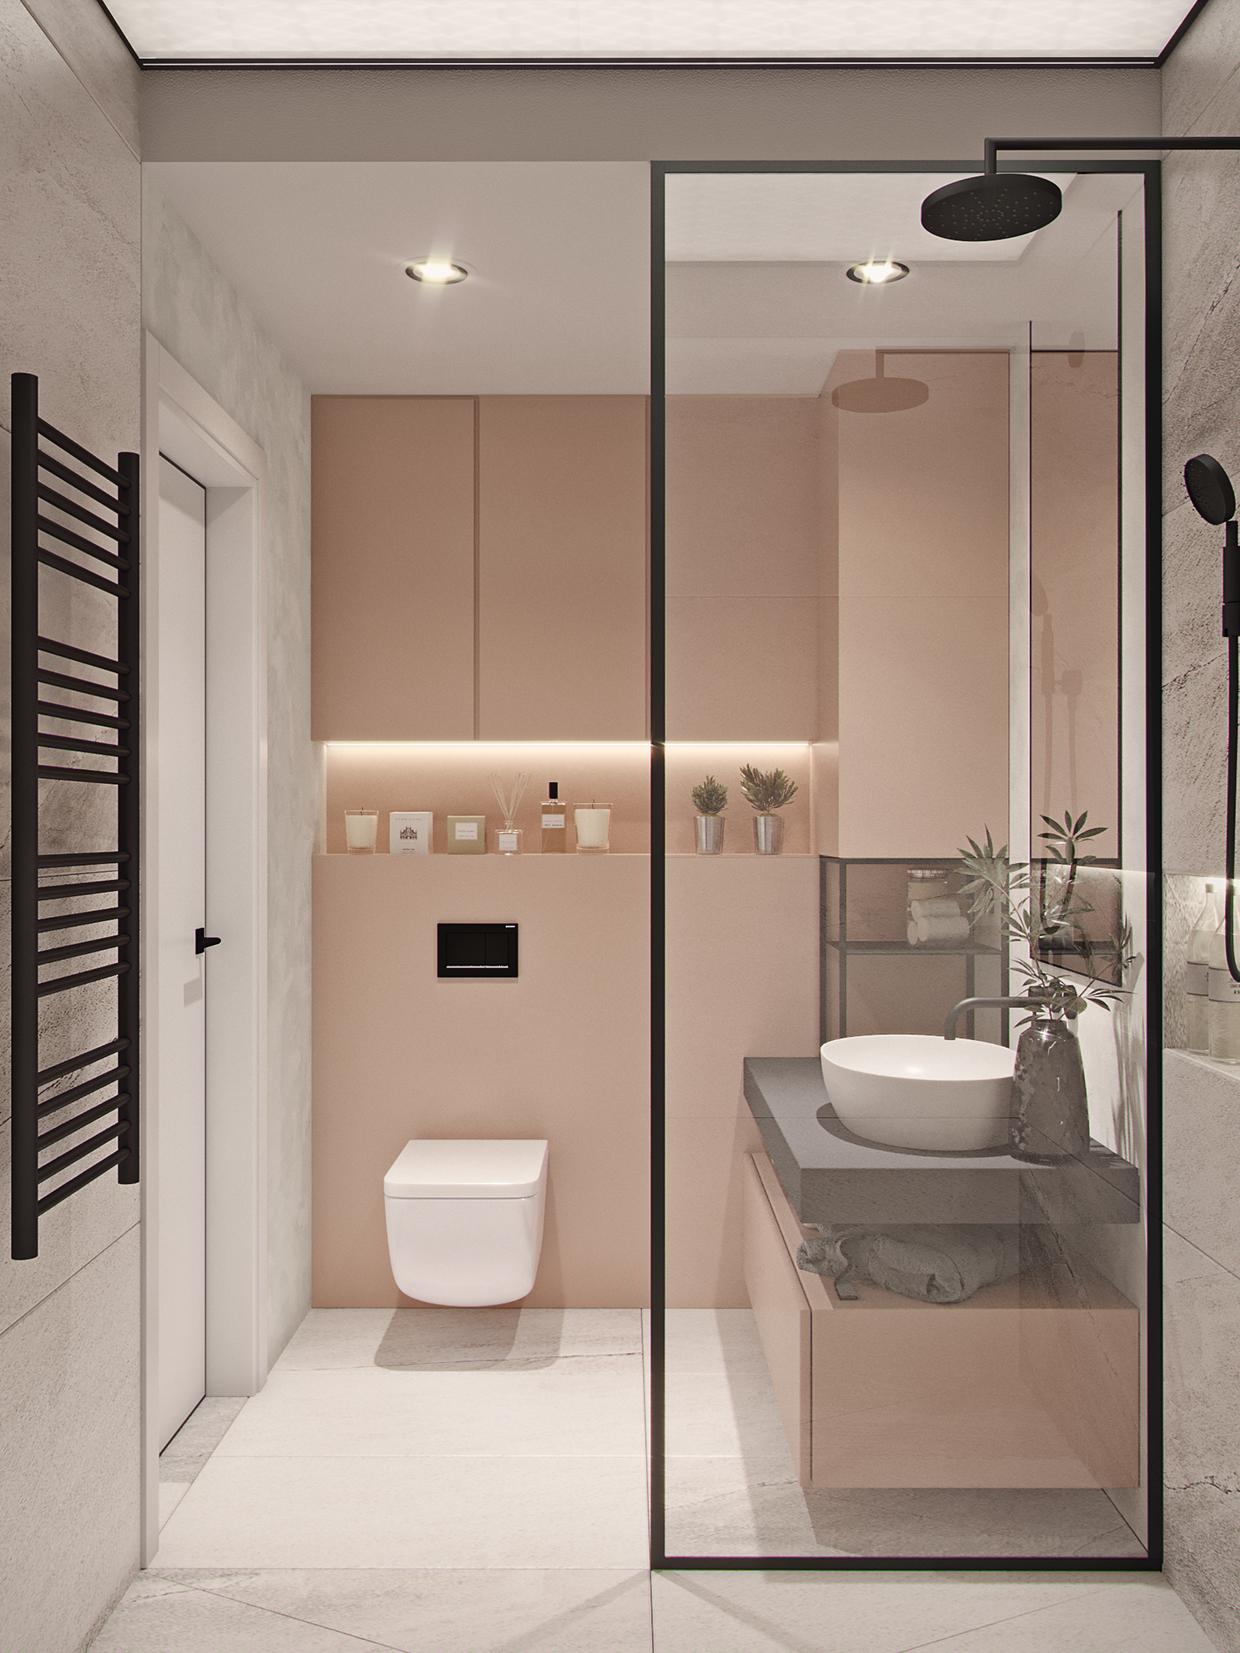 Faszinierend Badezimmer Schränke Das Beste Von De74a357430837.59d55c04d55b6.png (1240×1653) | Bagno | Inspiration |